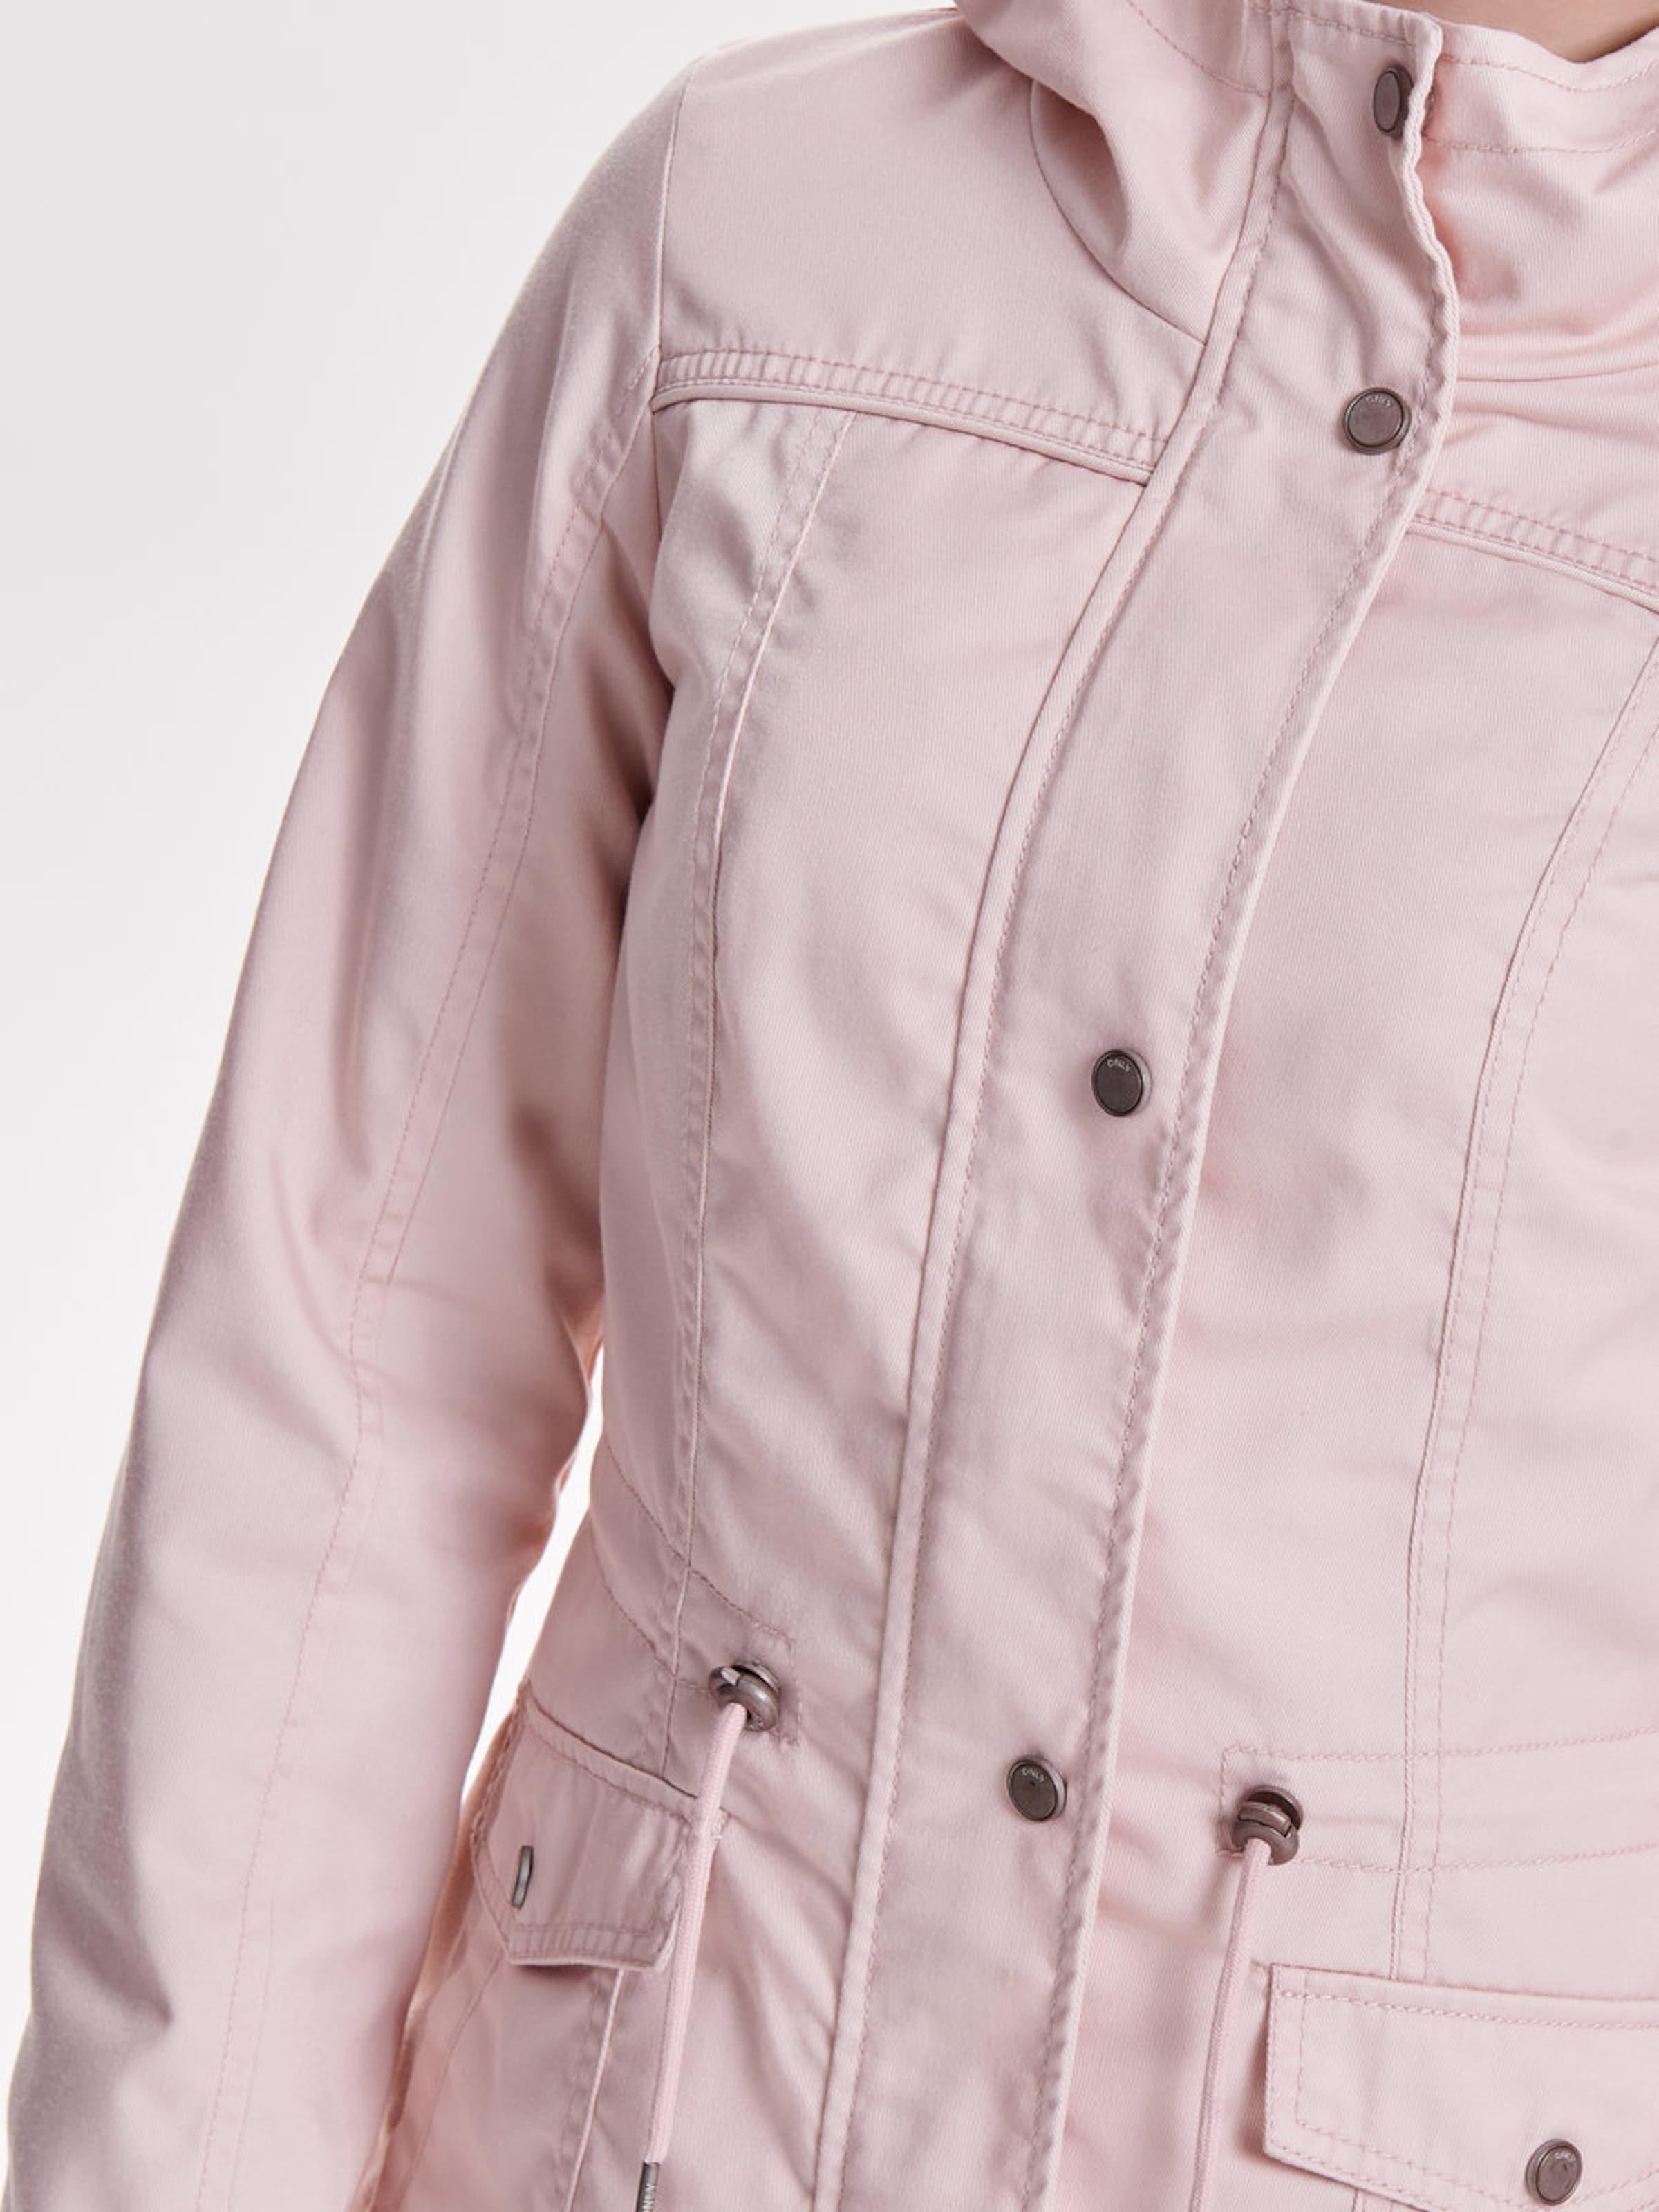 Offiziell ONLY Jacke 'KATE' Billig Verkauf Wirklich 0bZb4d